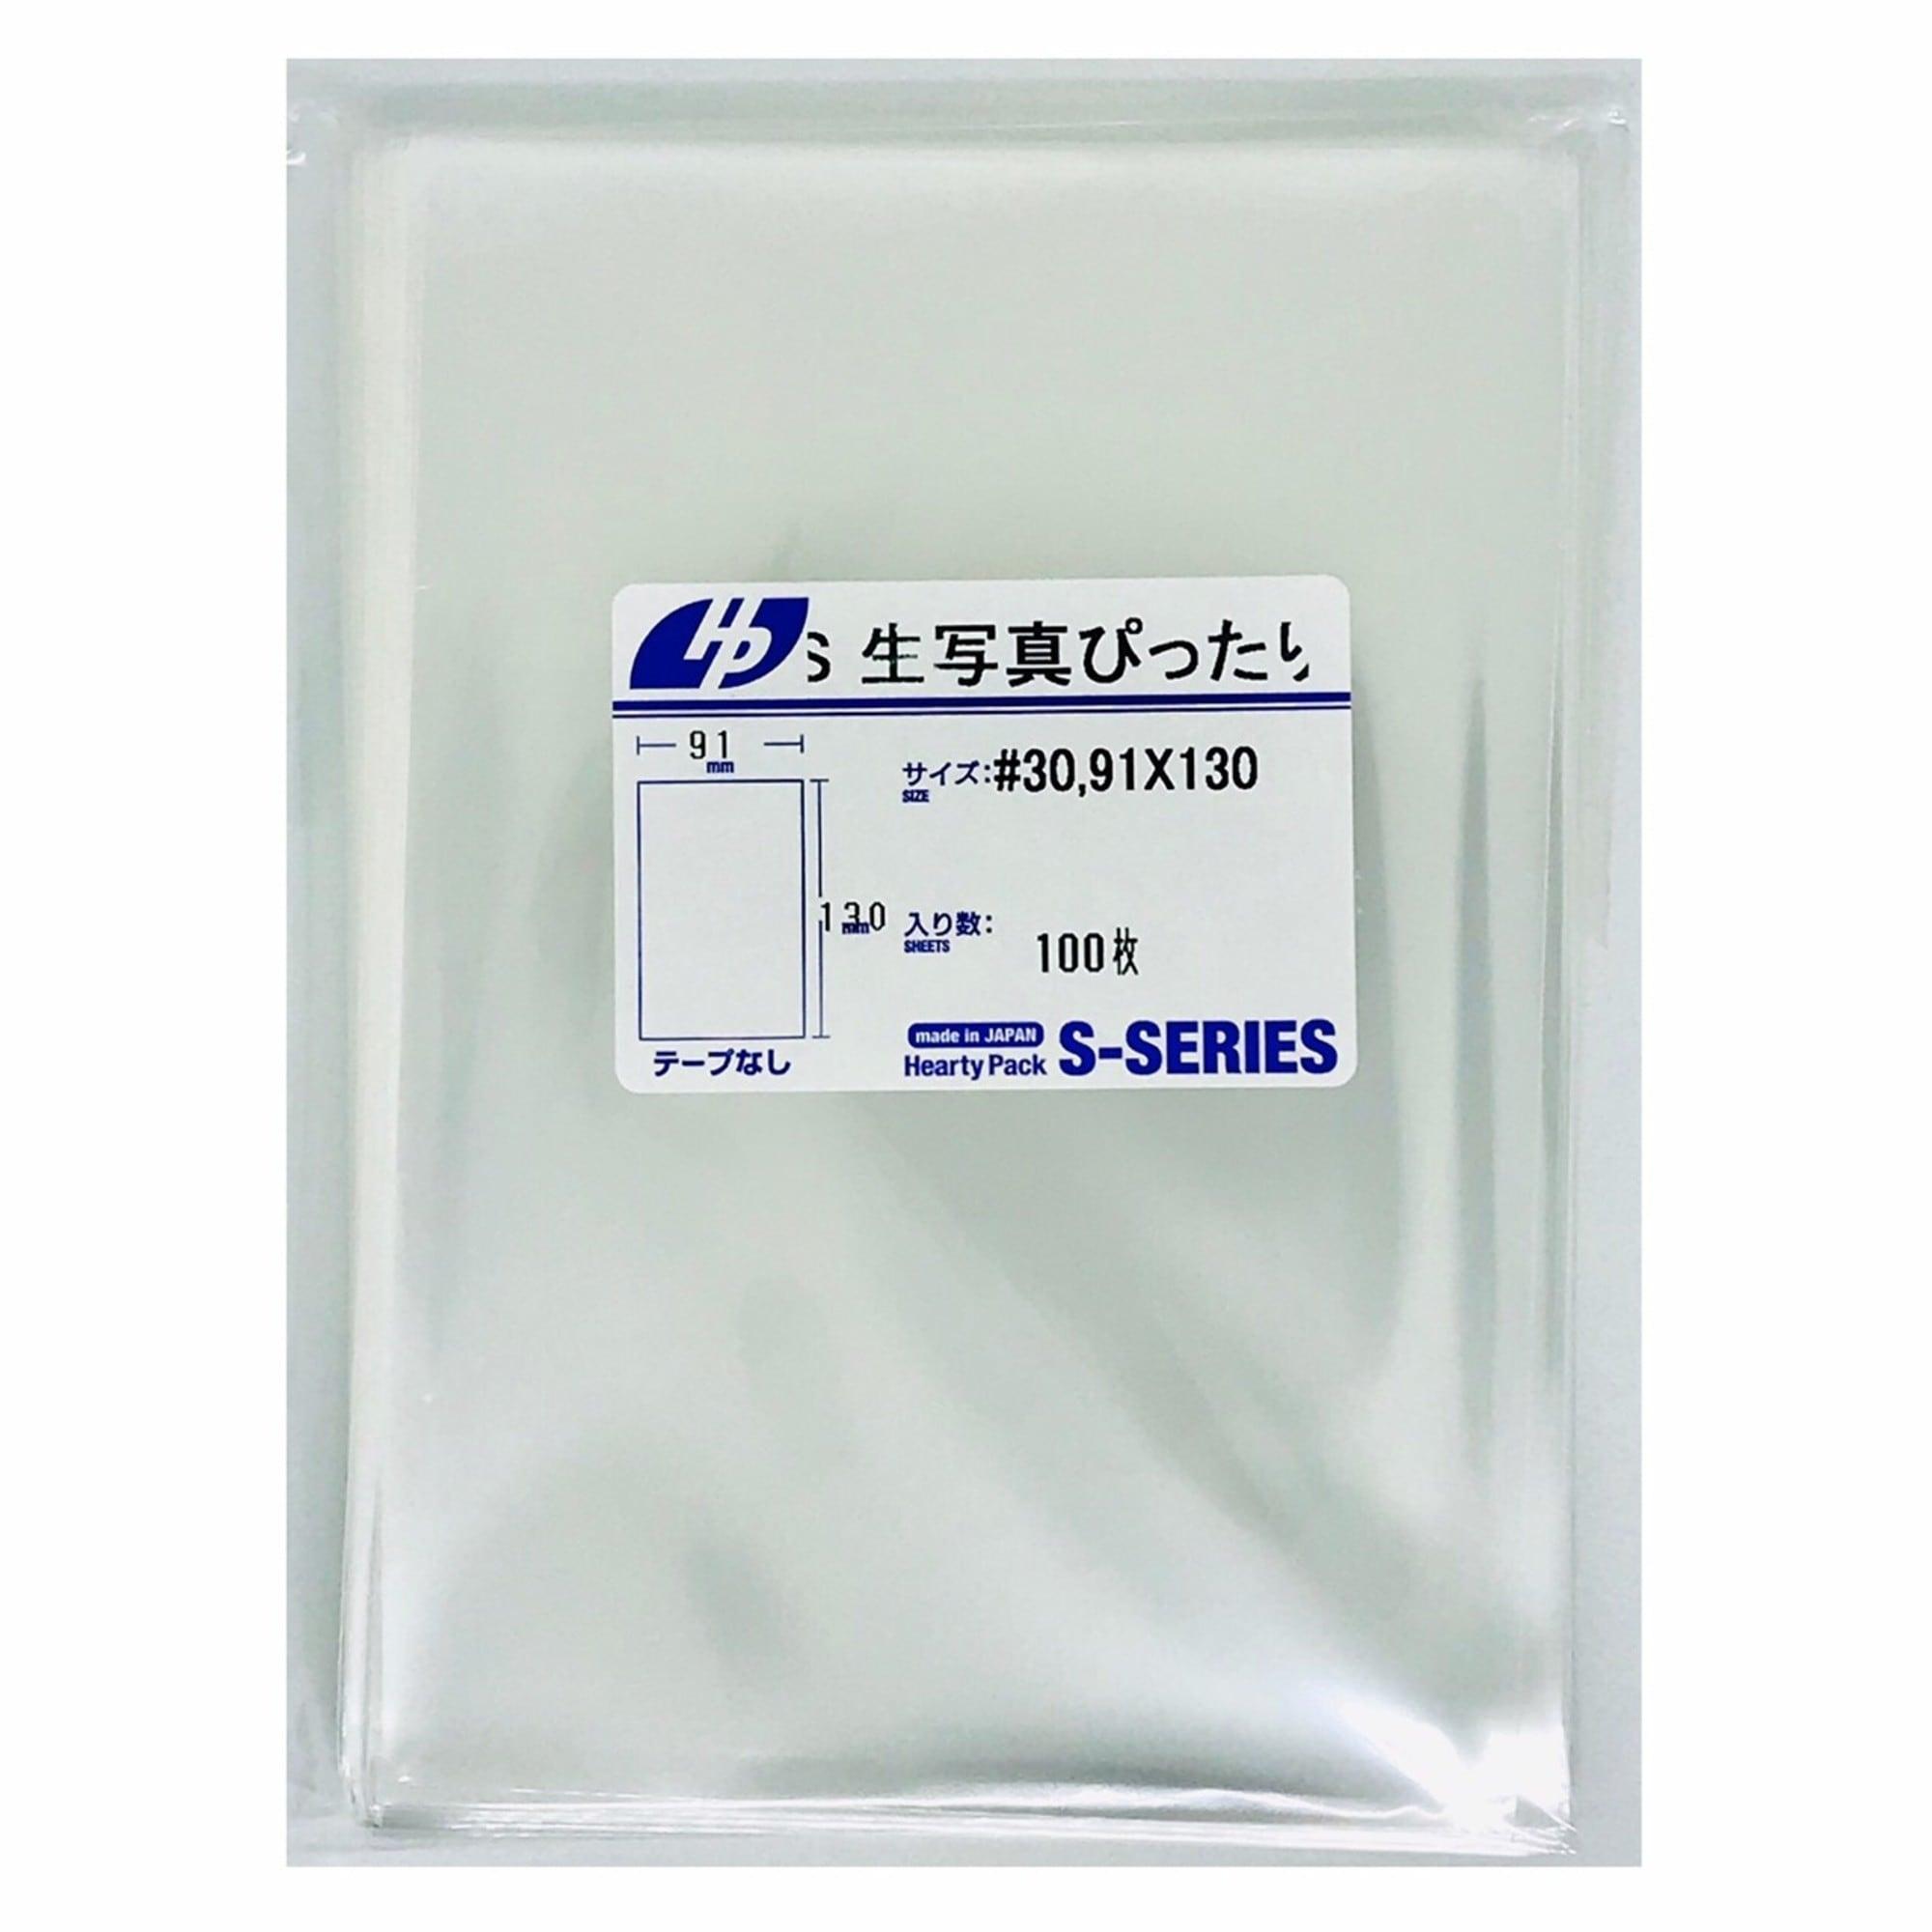 Hearty Pack L判 生写真 ぴったり スリーブ テープなし 91x130 OPP (100枚)